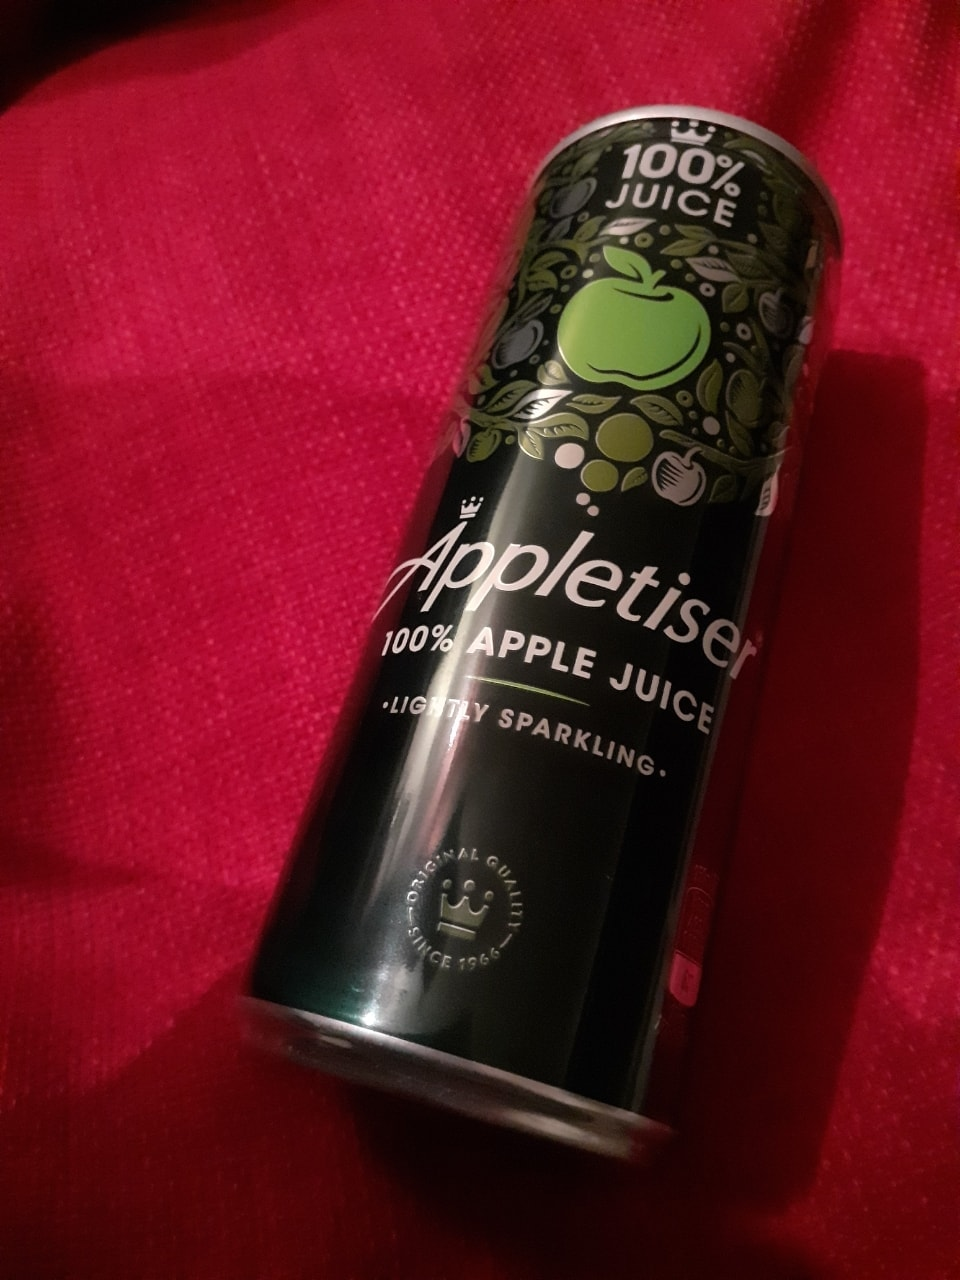 Can of appletiser